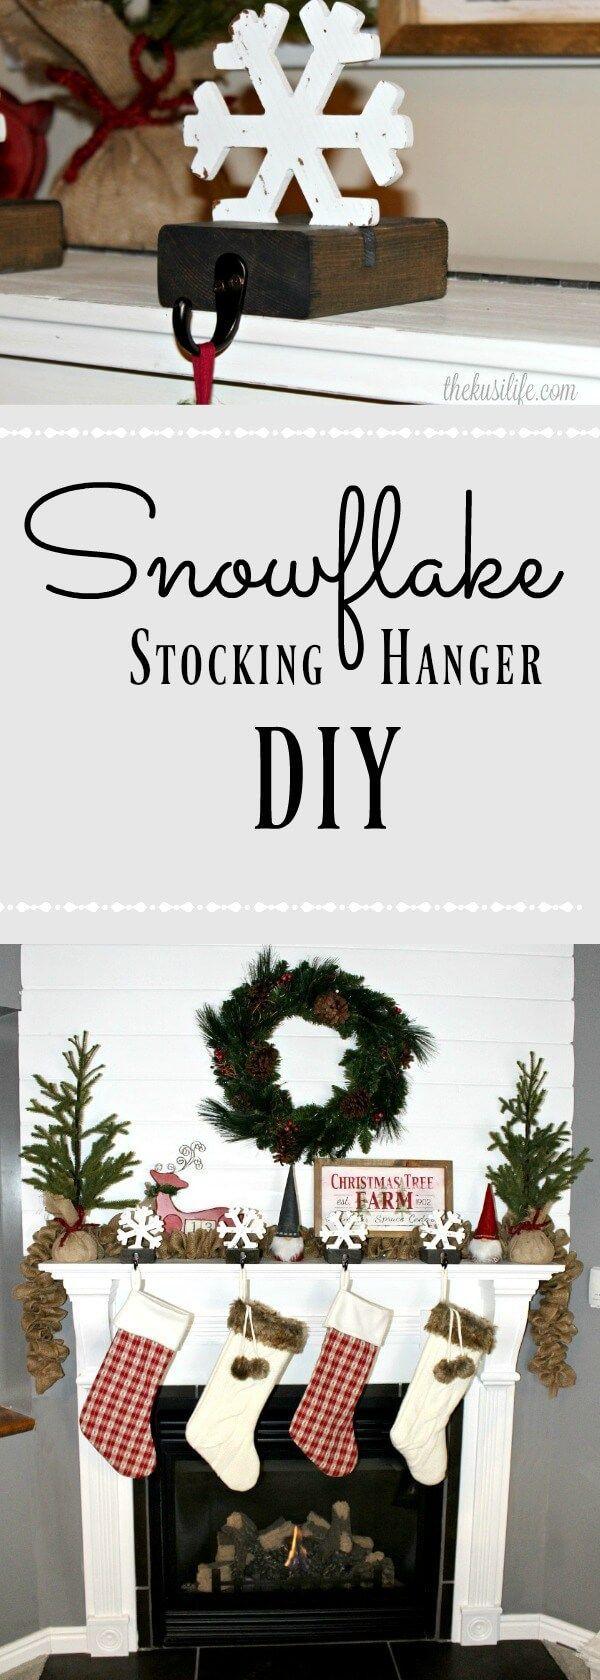 Snowflake Stocking Hanger-DIY via @thekusilife